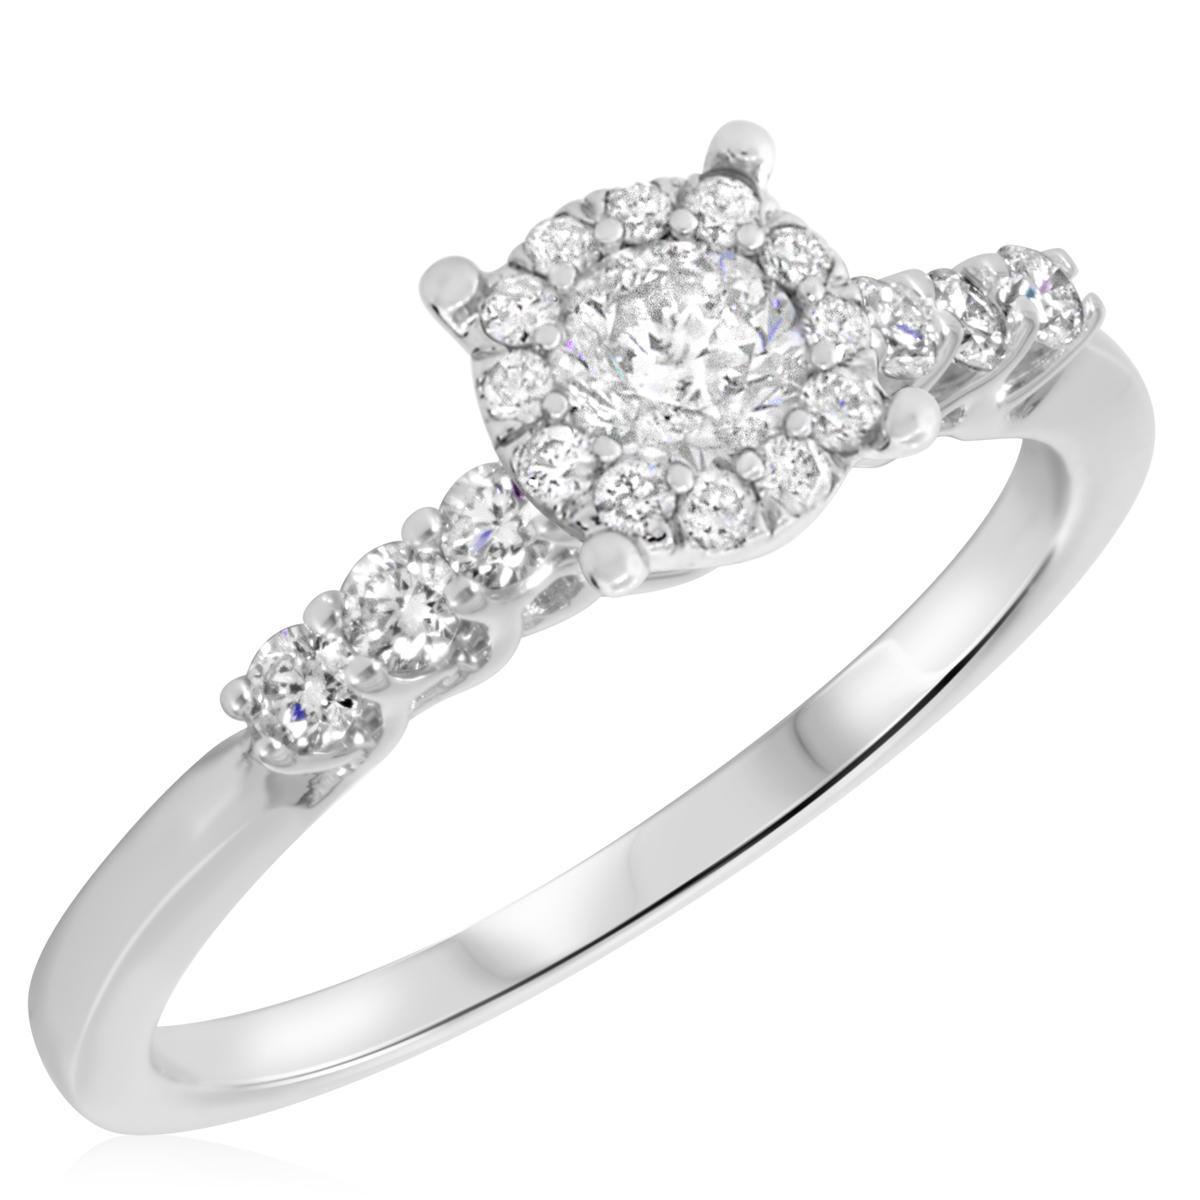 5/8 CT. T.W. Diamond Ladies Engagement Ring 14K White Gold- Size 8